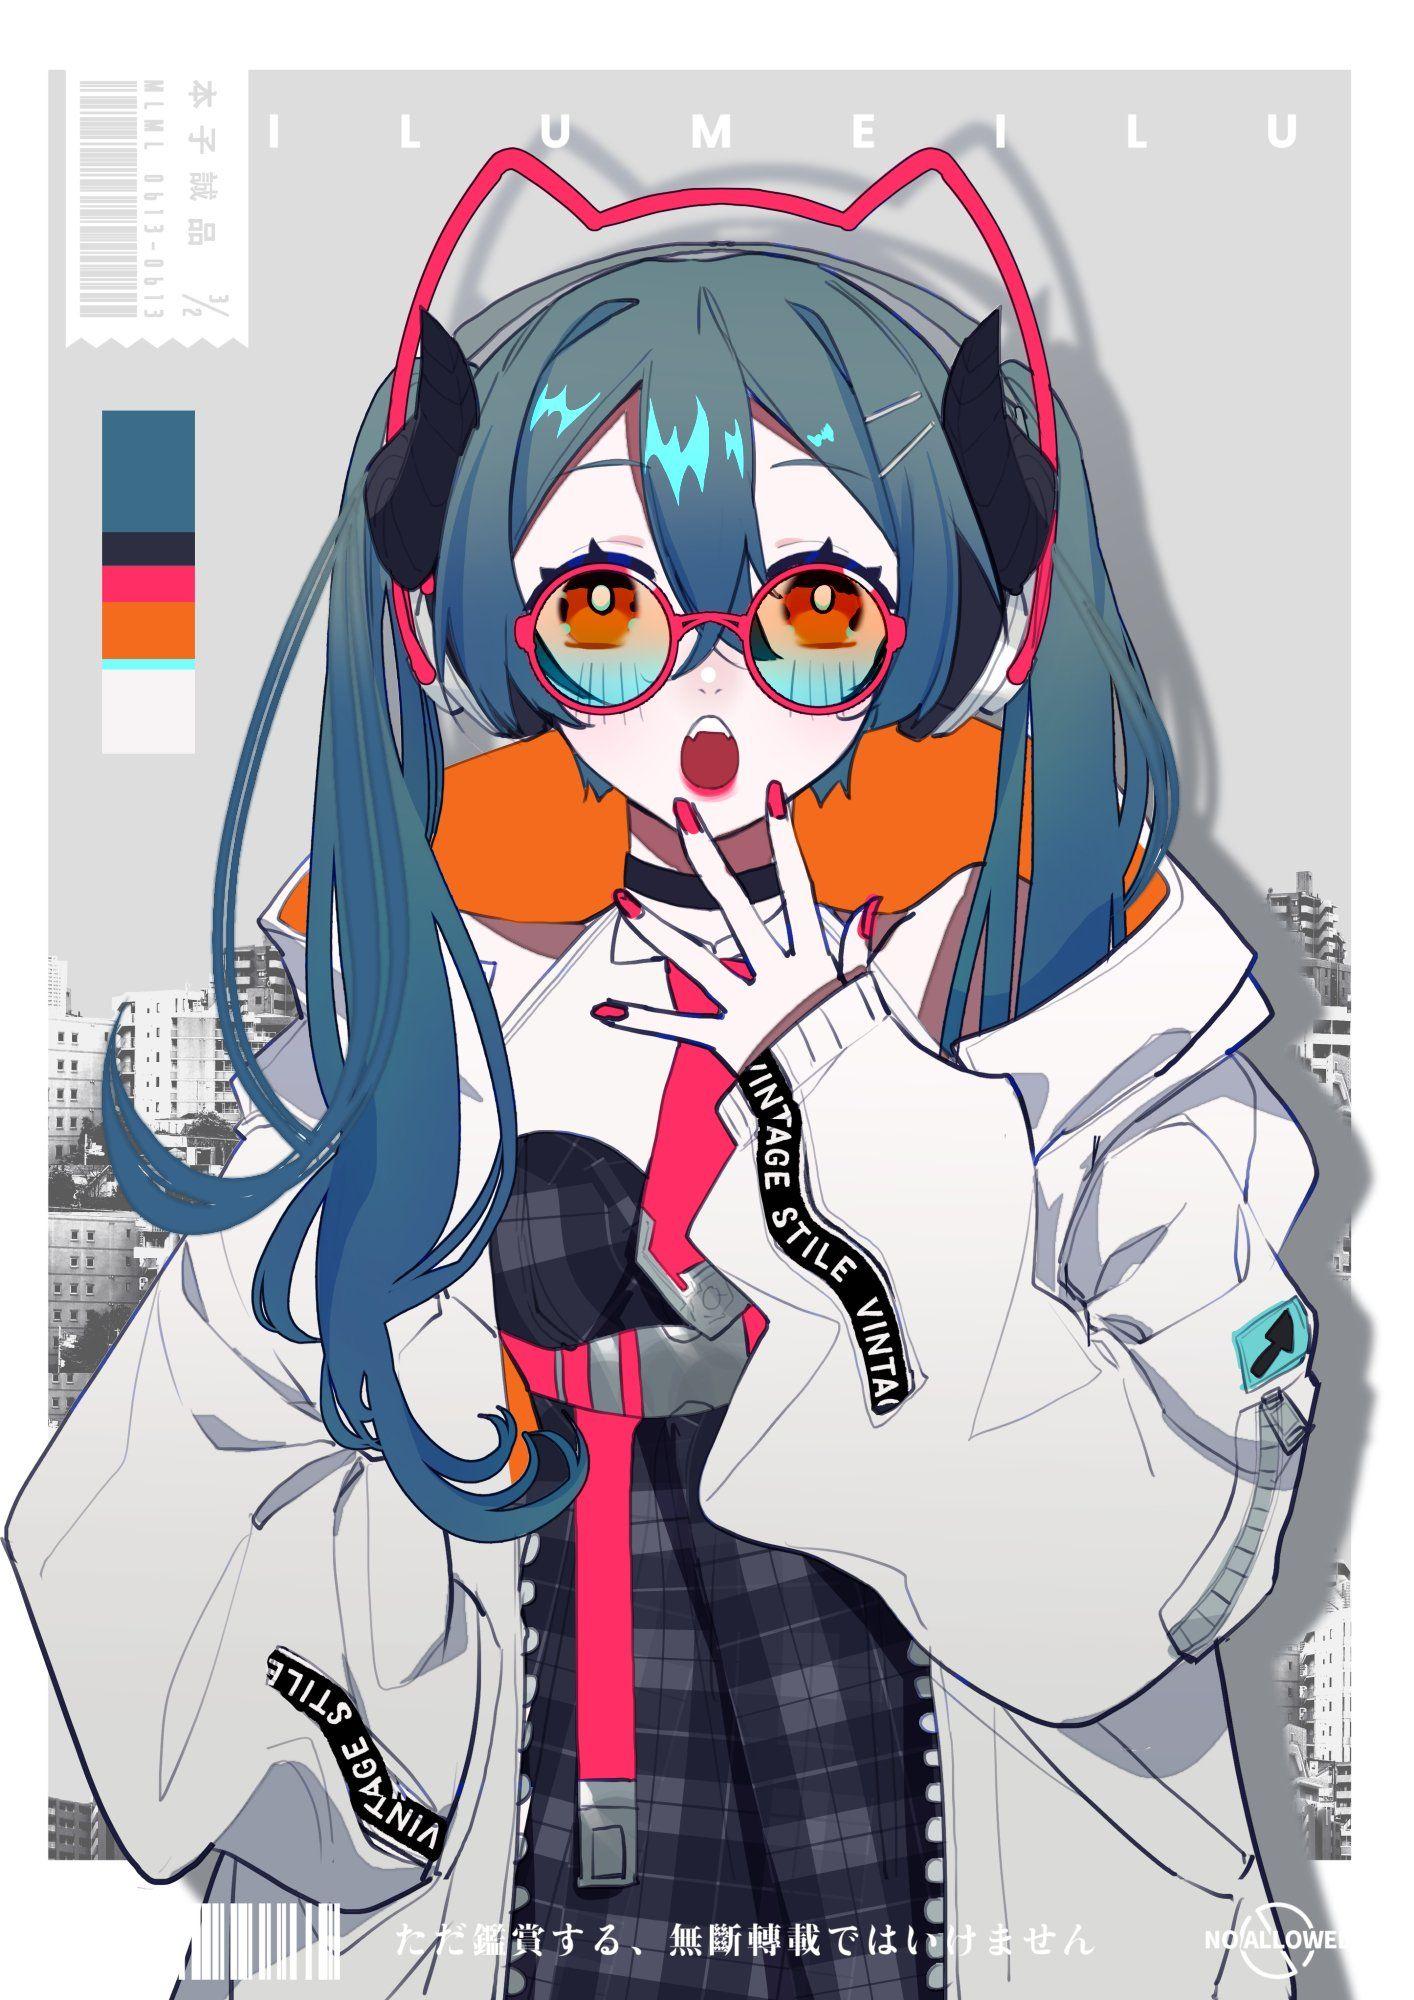 Pin by òwó on characters. ♡ Anime art beautiful, Anime